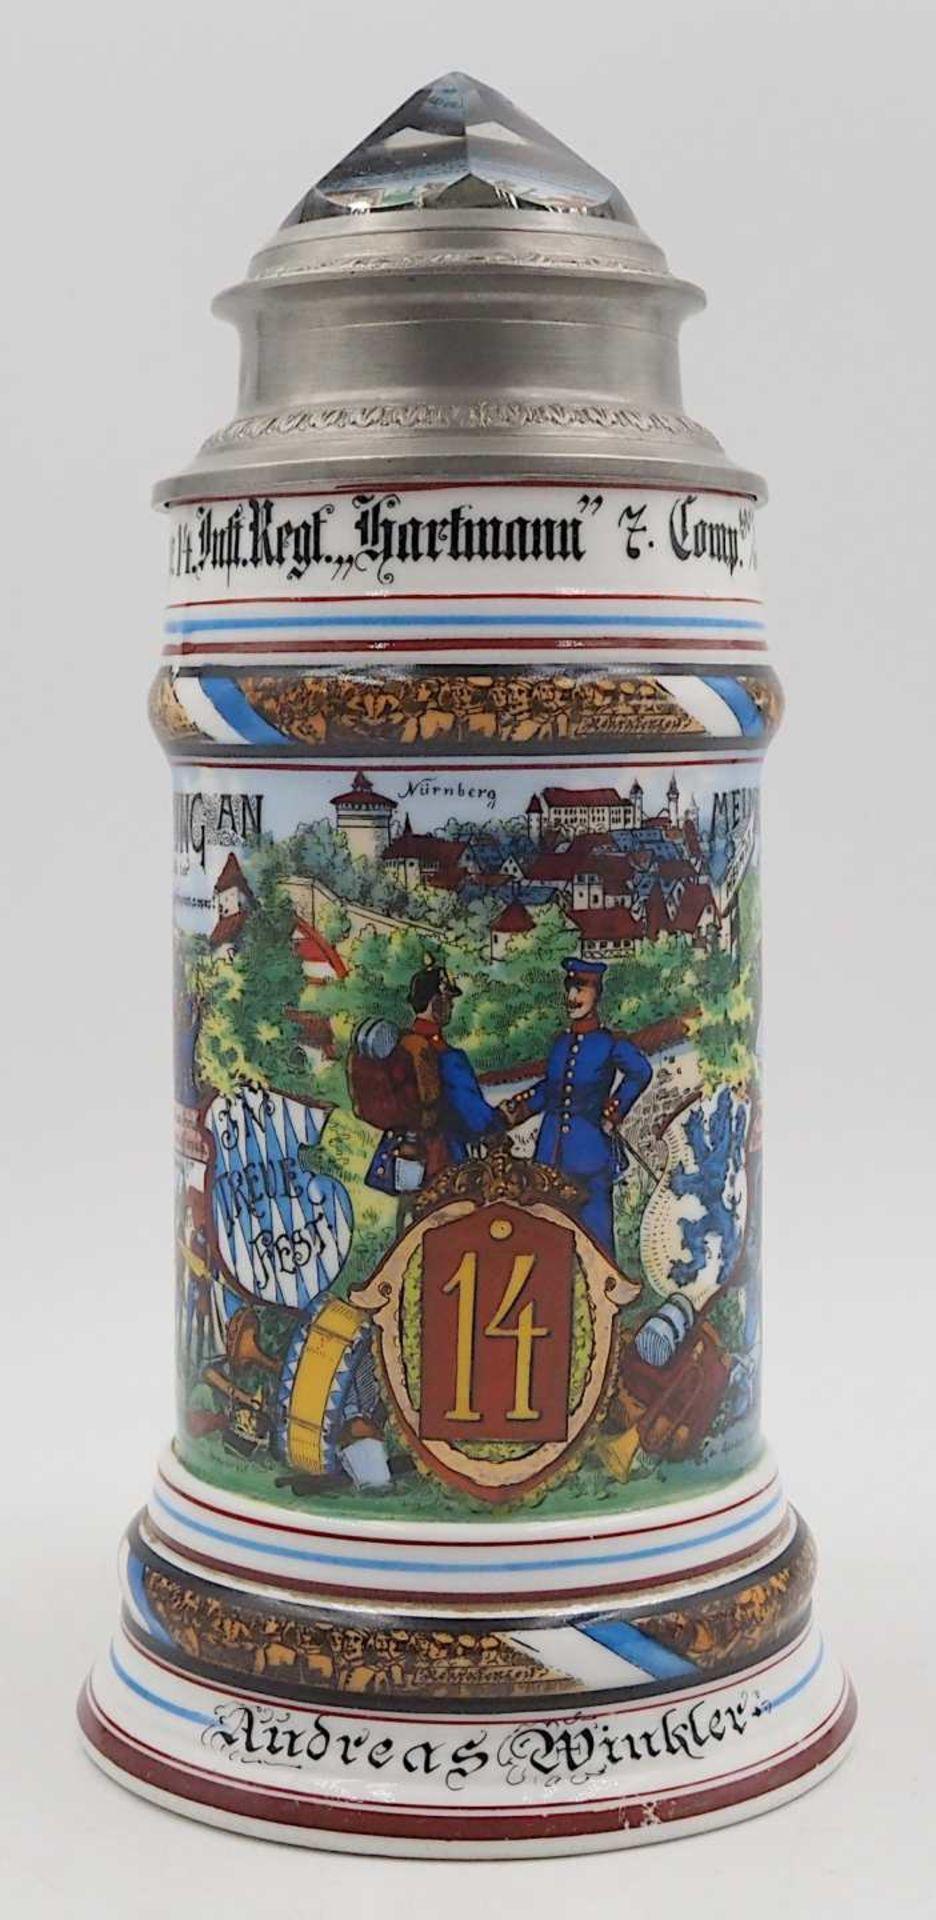 "1 Reservistenkrug ""Kgl. bayr. 14. Inft. Regt. ""Hartmann"" 7. Comp. Nürnberg 1904-06"" W"